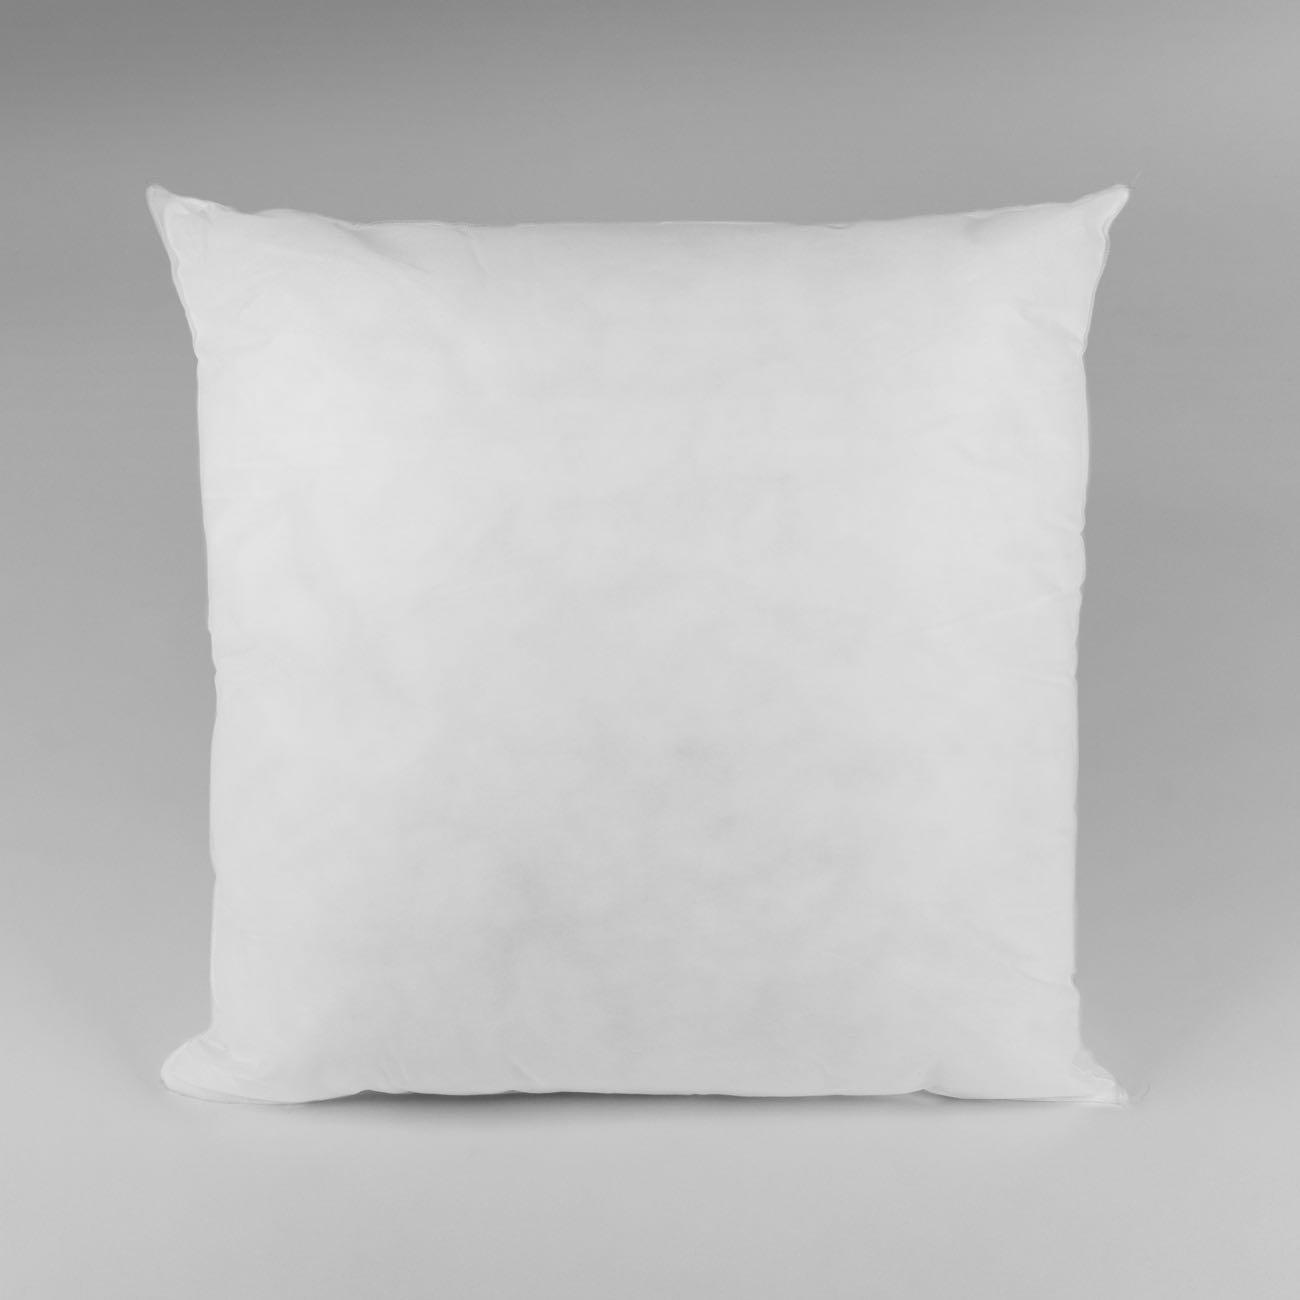 Enchimento Almofada 80x80 cm Branco Catherine Lansfield